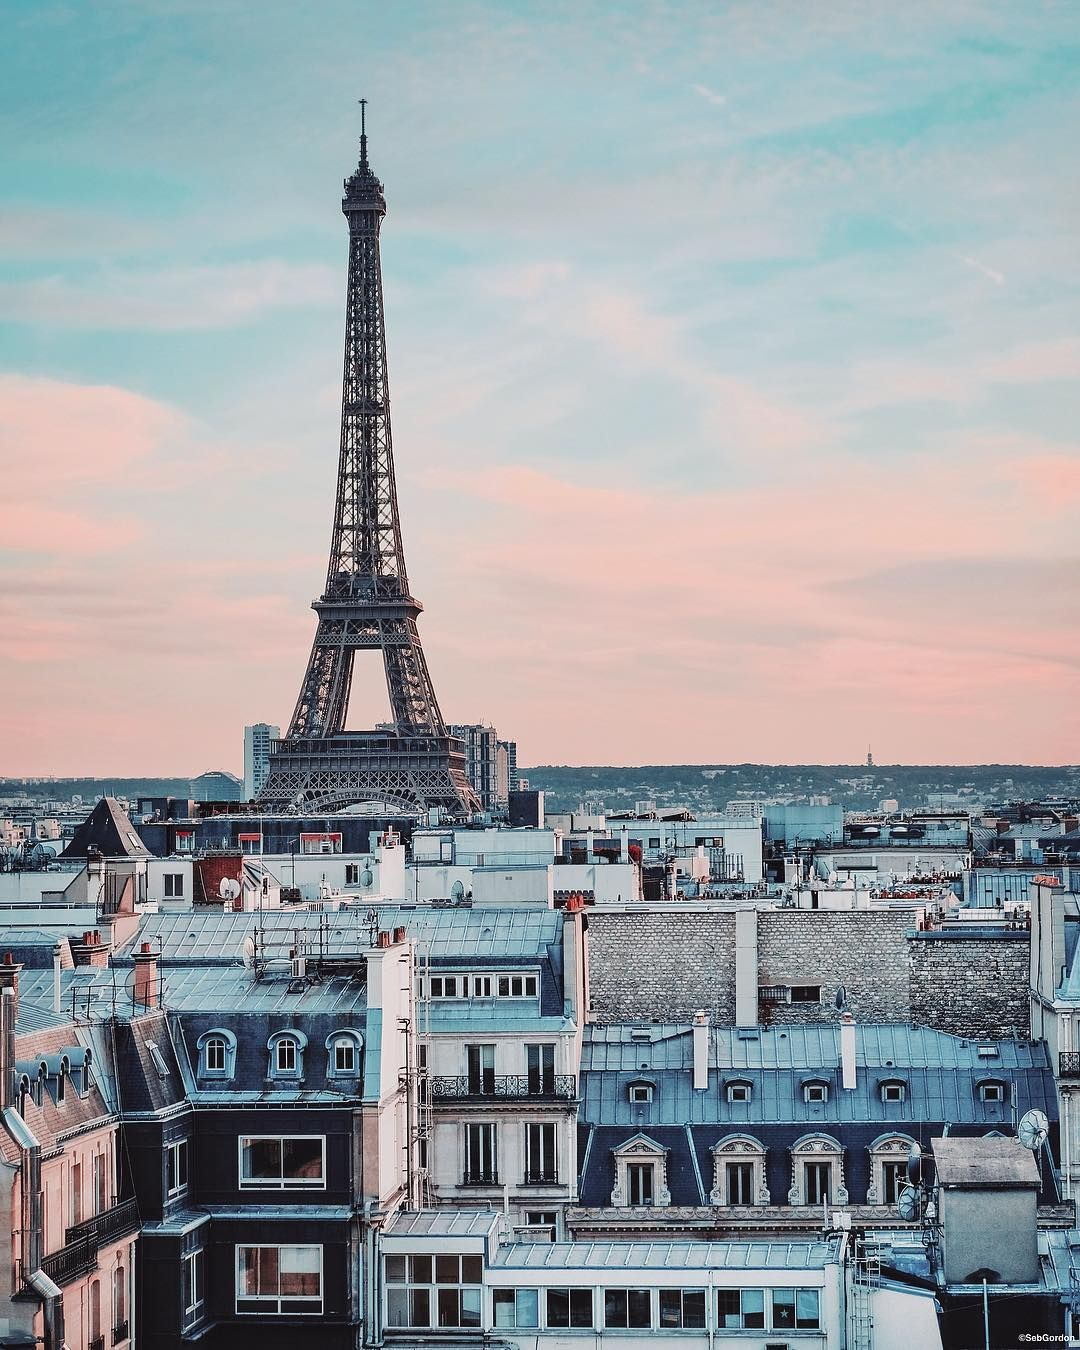 ᴹᴬᵞ ᵀᴴᴱ ᴿᴬᴳᴱ ᴮᴱ ᵂᴵᵀᴴ ᵞᴼᵁ ᴰᴬᵂᴺᴾᴬᵀᴿᴼᴸᴷᴬᵀ Paris Travel France Travel Travel Pictures